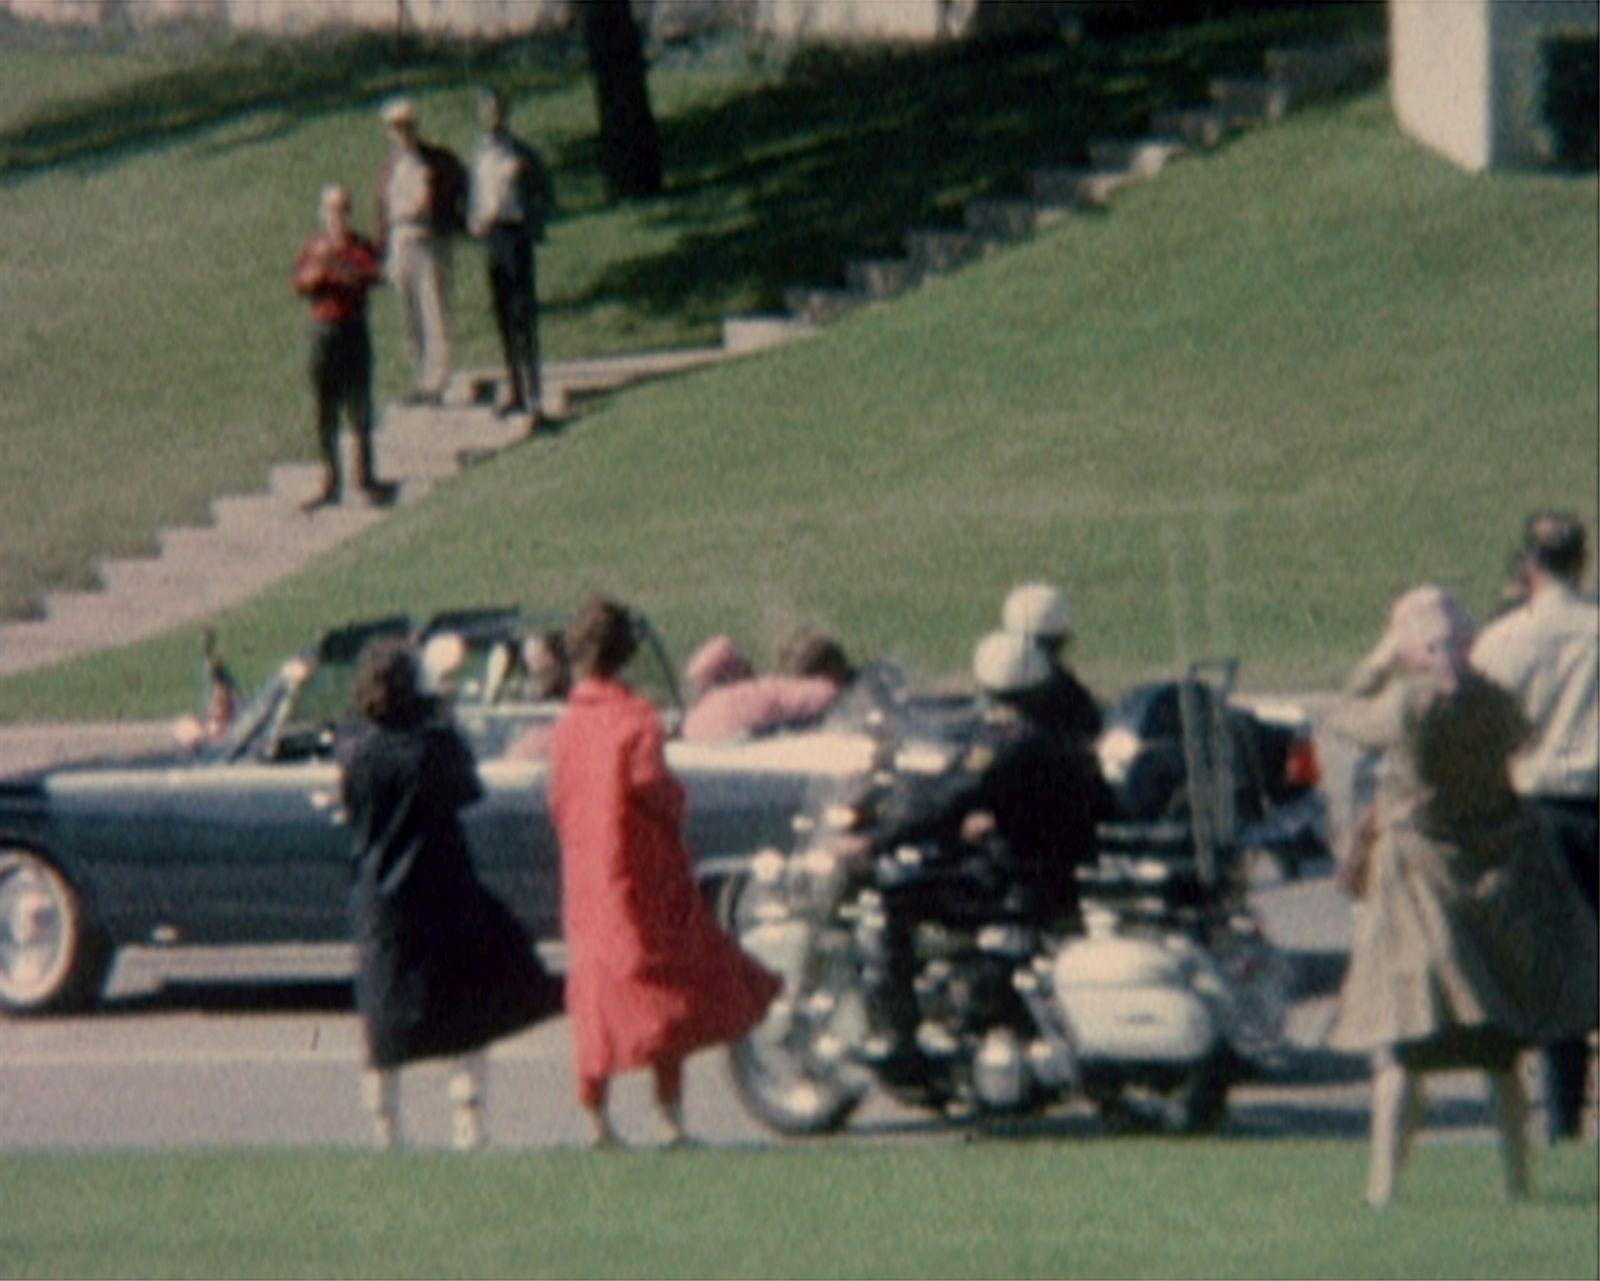 Dallas/ Attentat auf JFK